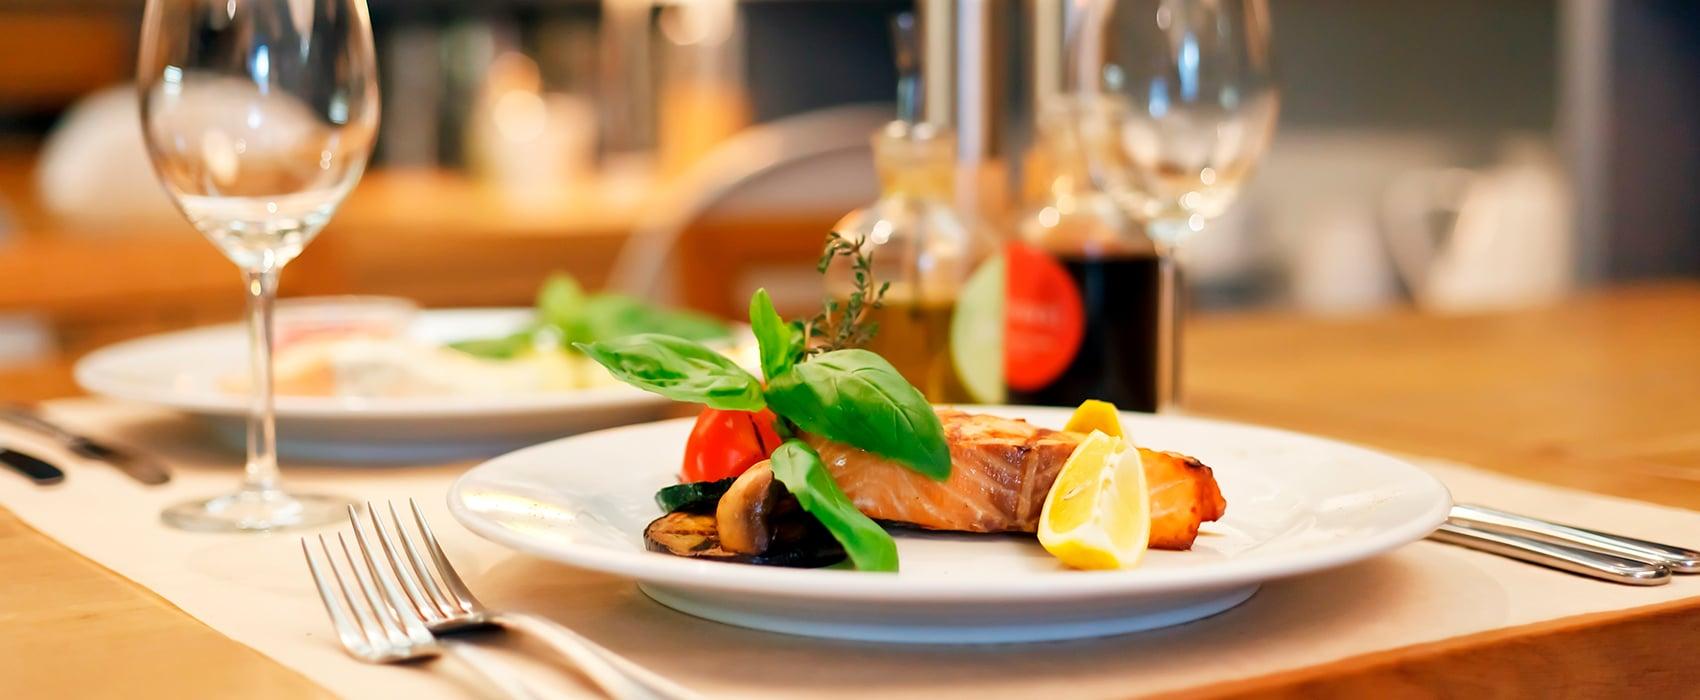 restaurants & bars desire cruises